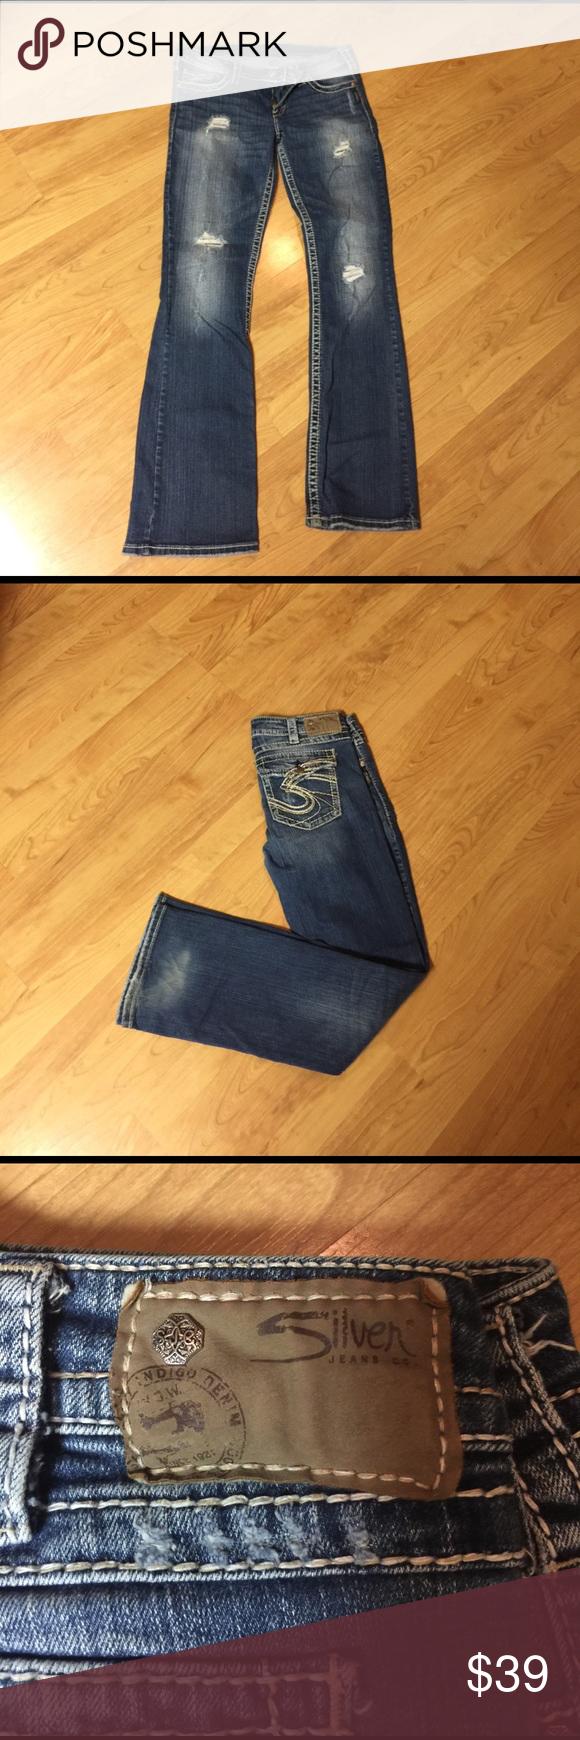 Silver Jeans Size 32/33 silver jeans. Silver Jeans Pants Boot Cut ...